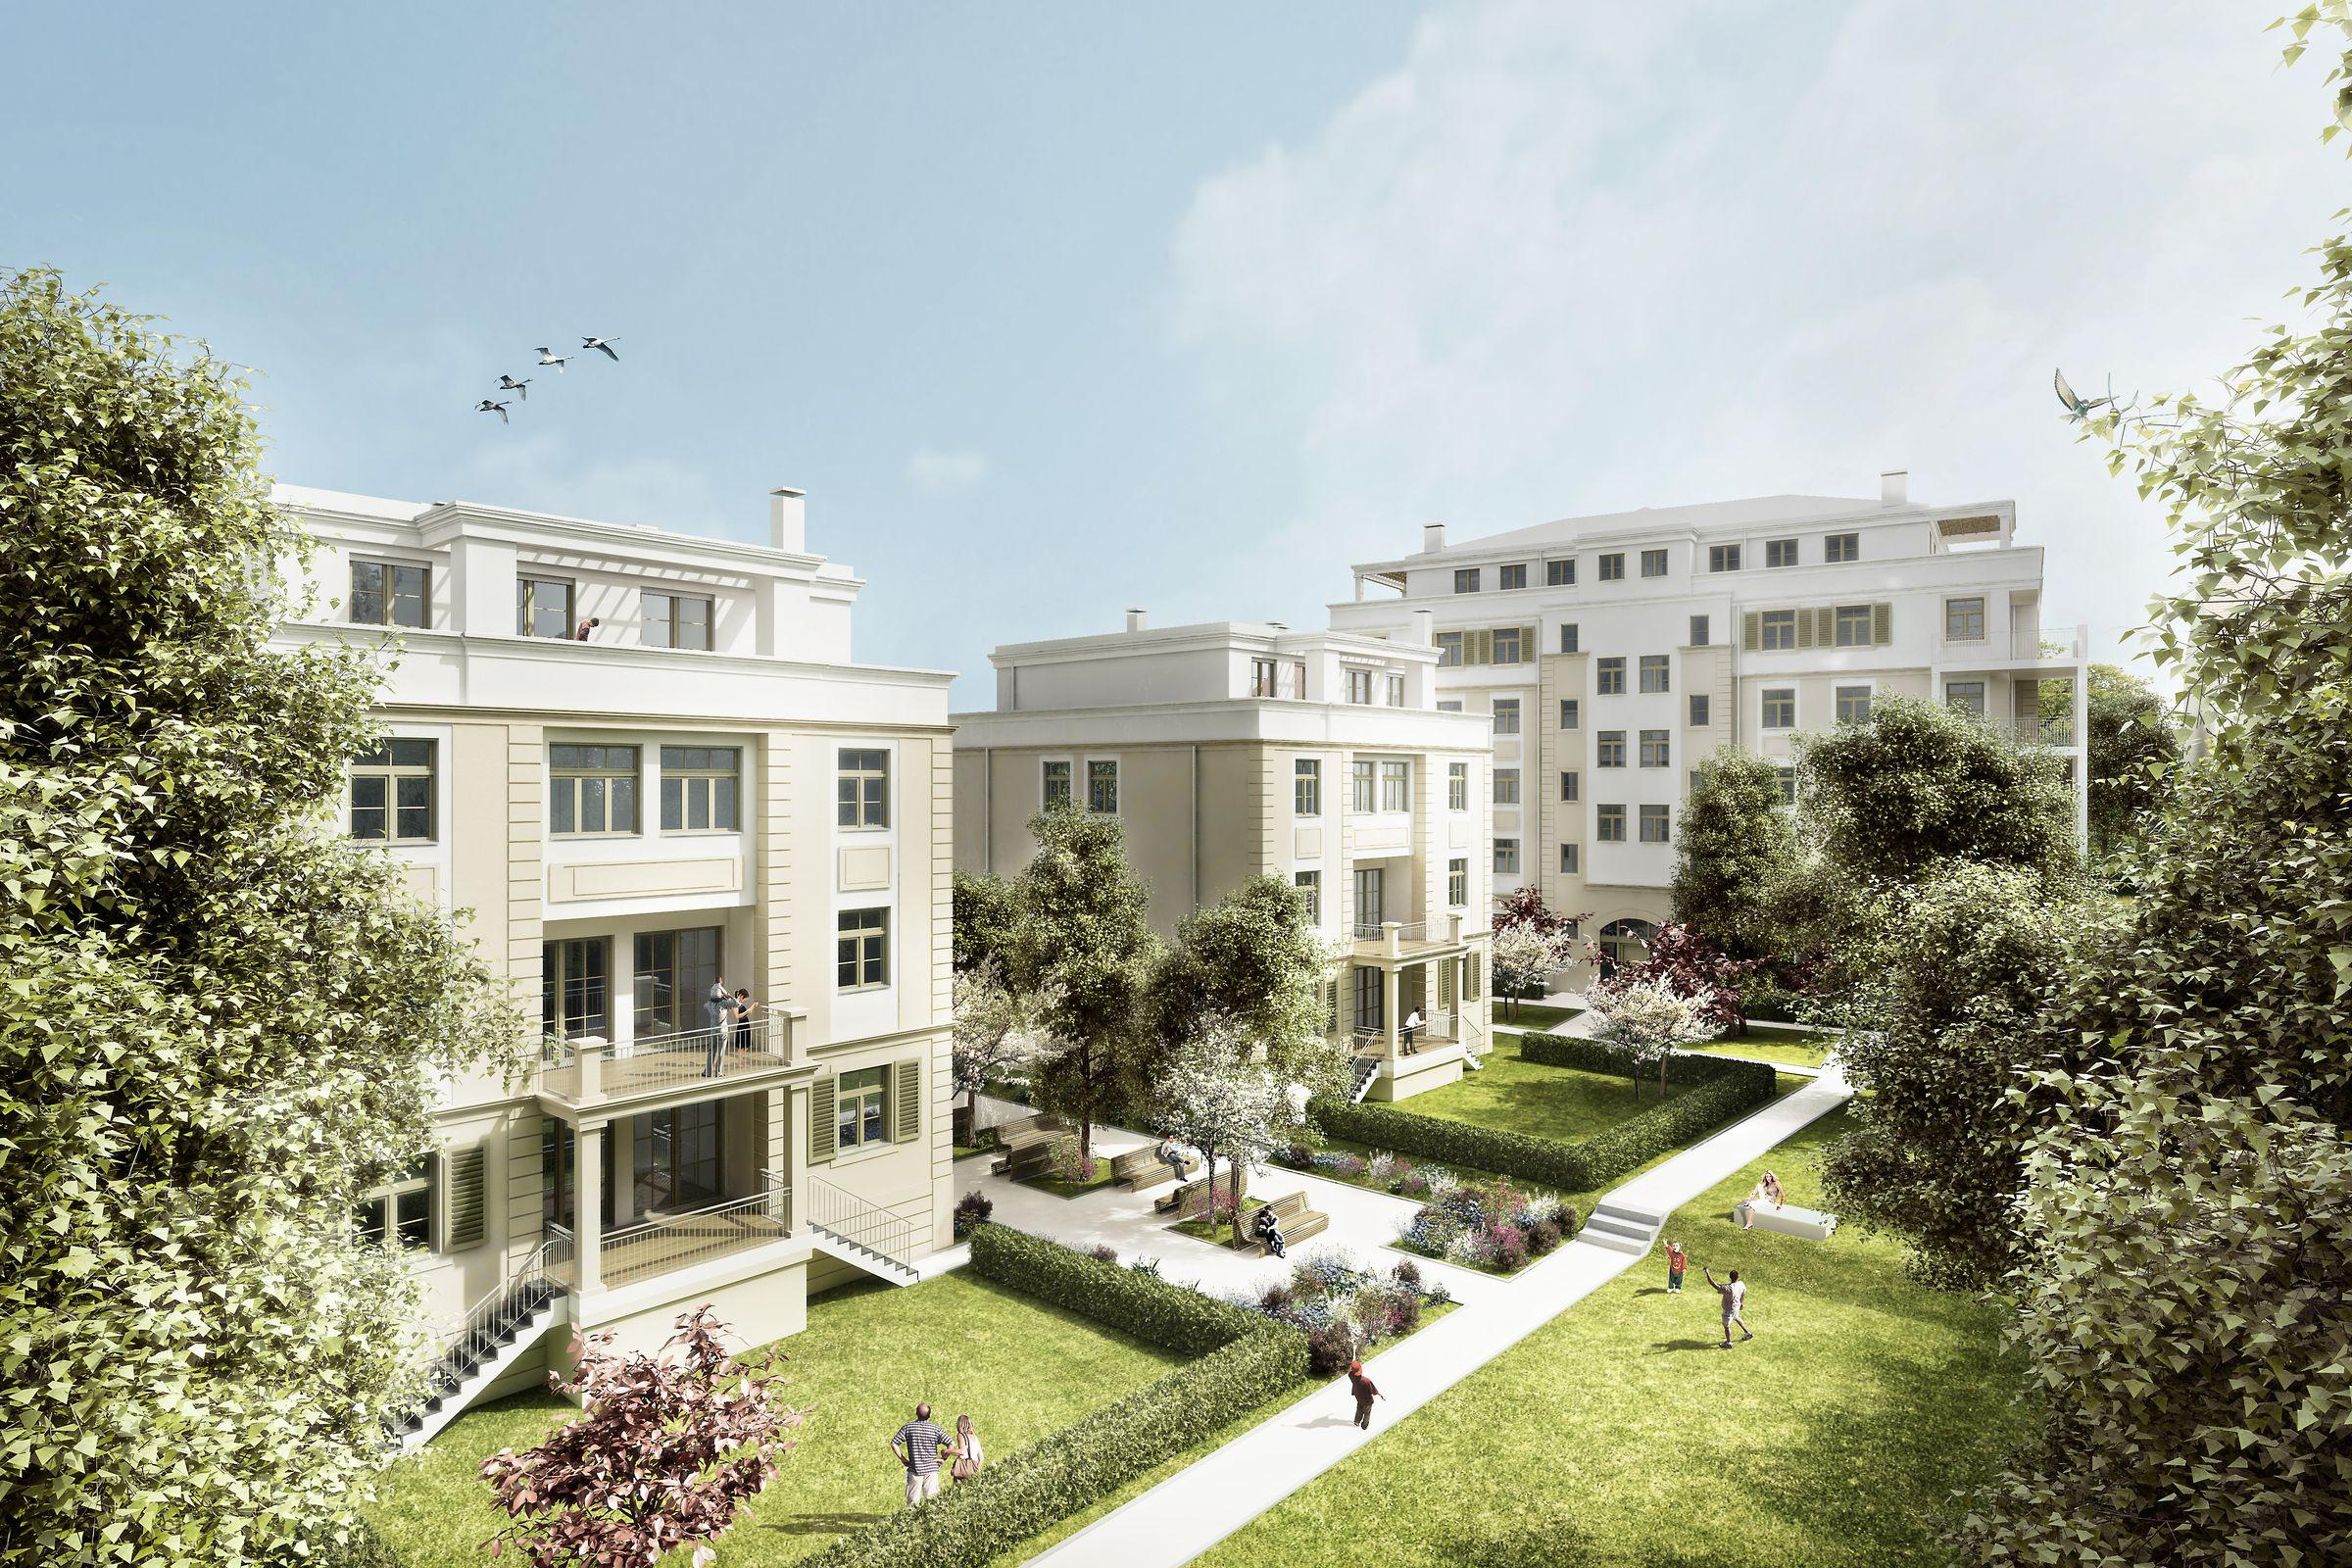 __Seidel_Architekten_Planet_Home_Parkpalais_Striesen ### parkpalais_striesen_vogel_120210_02